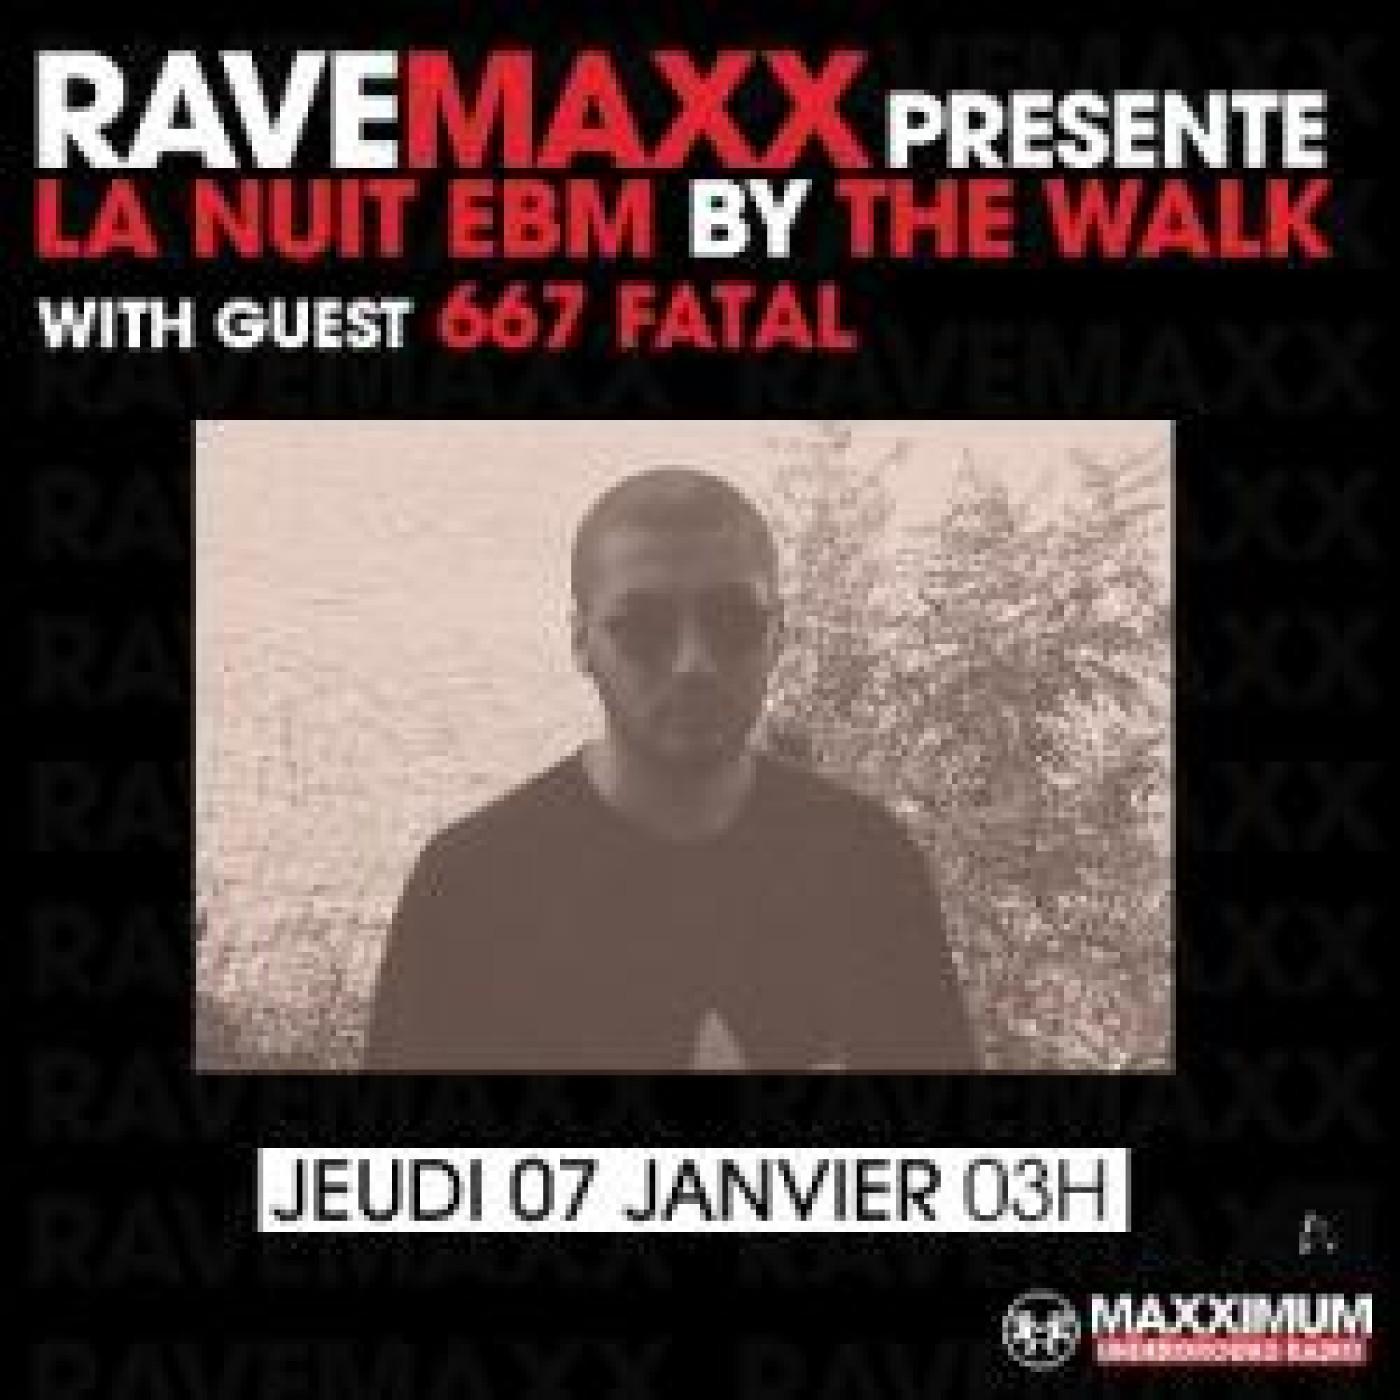 RAVEMAXX : 667 FATAL